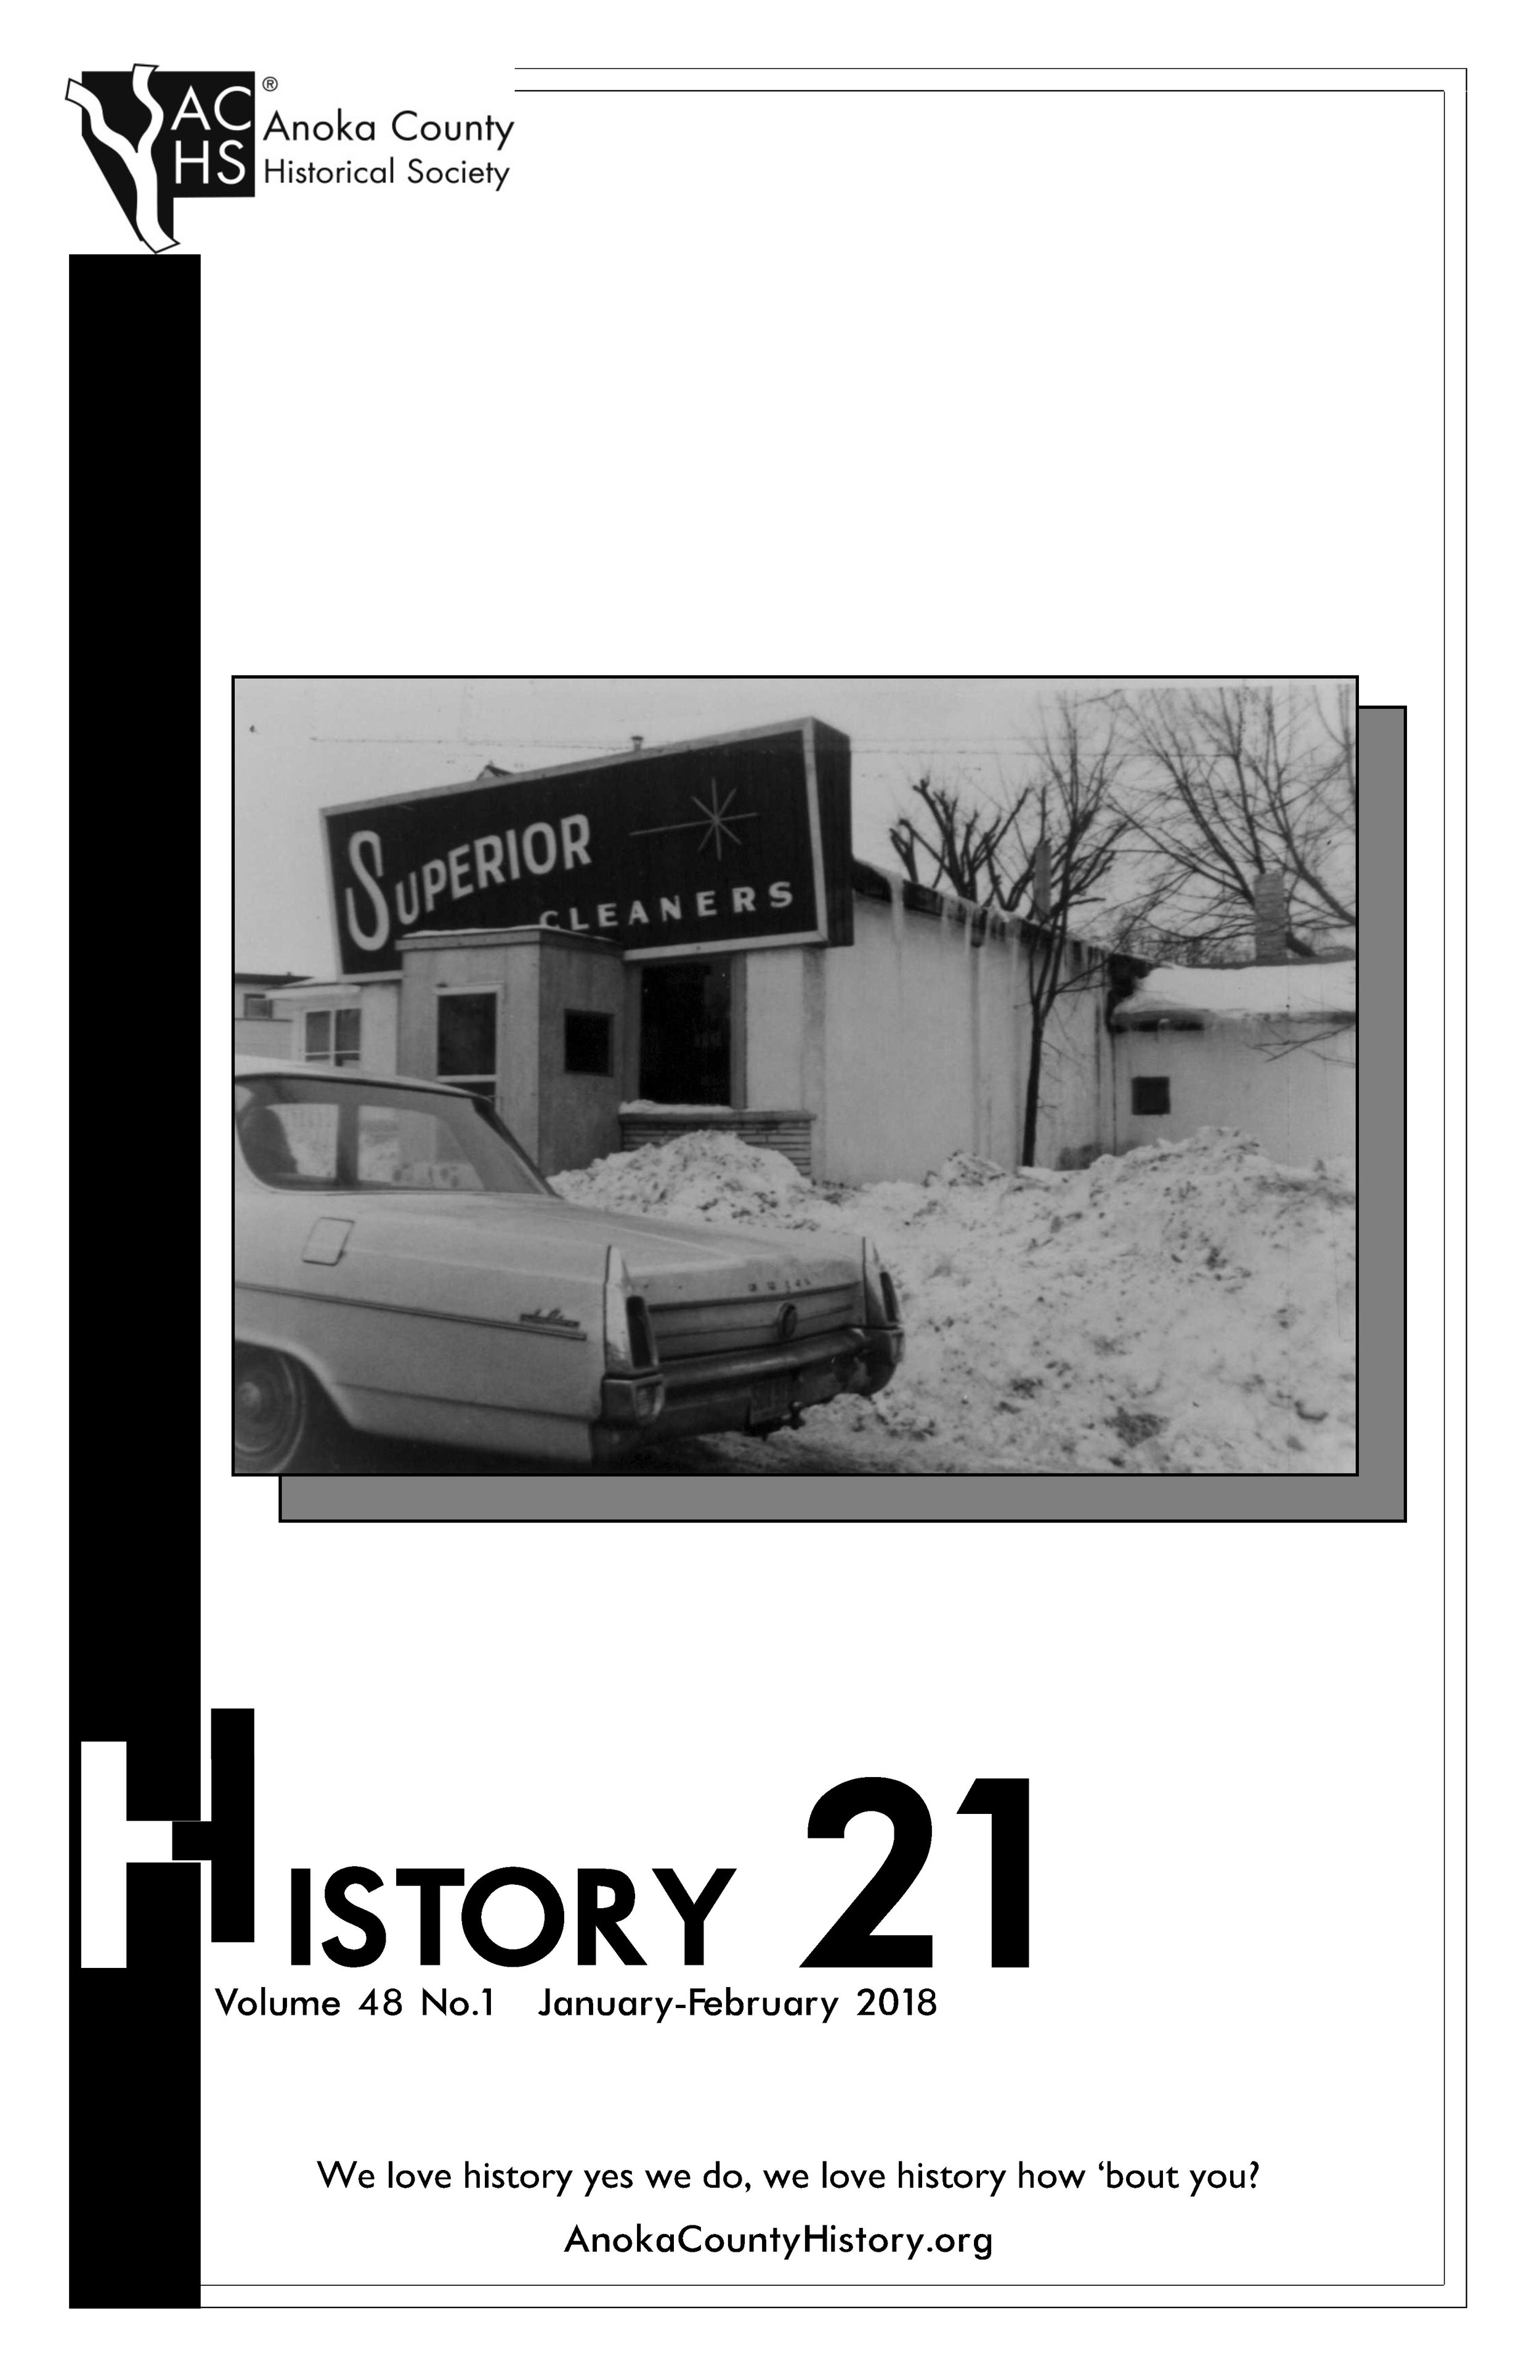 History 21 Jan/Feb 2018